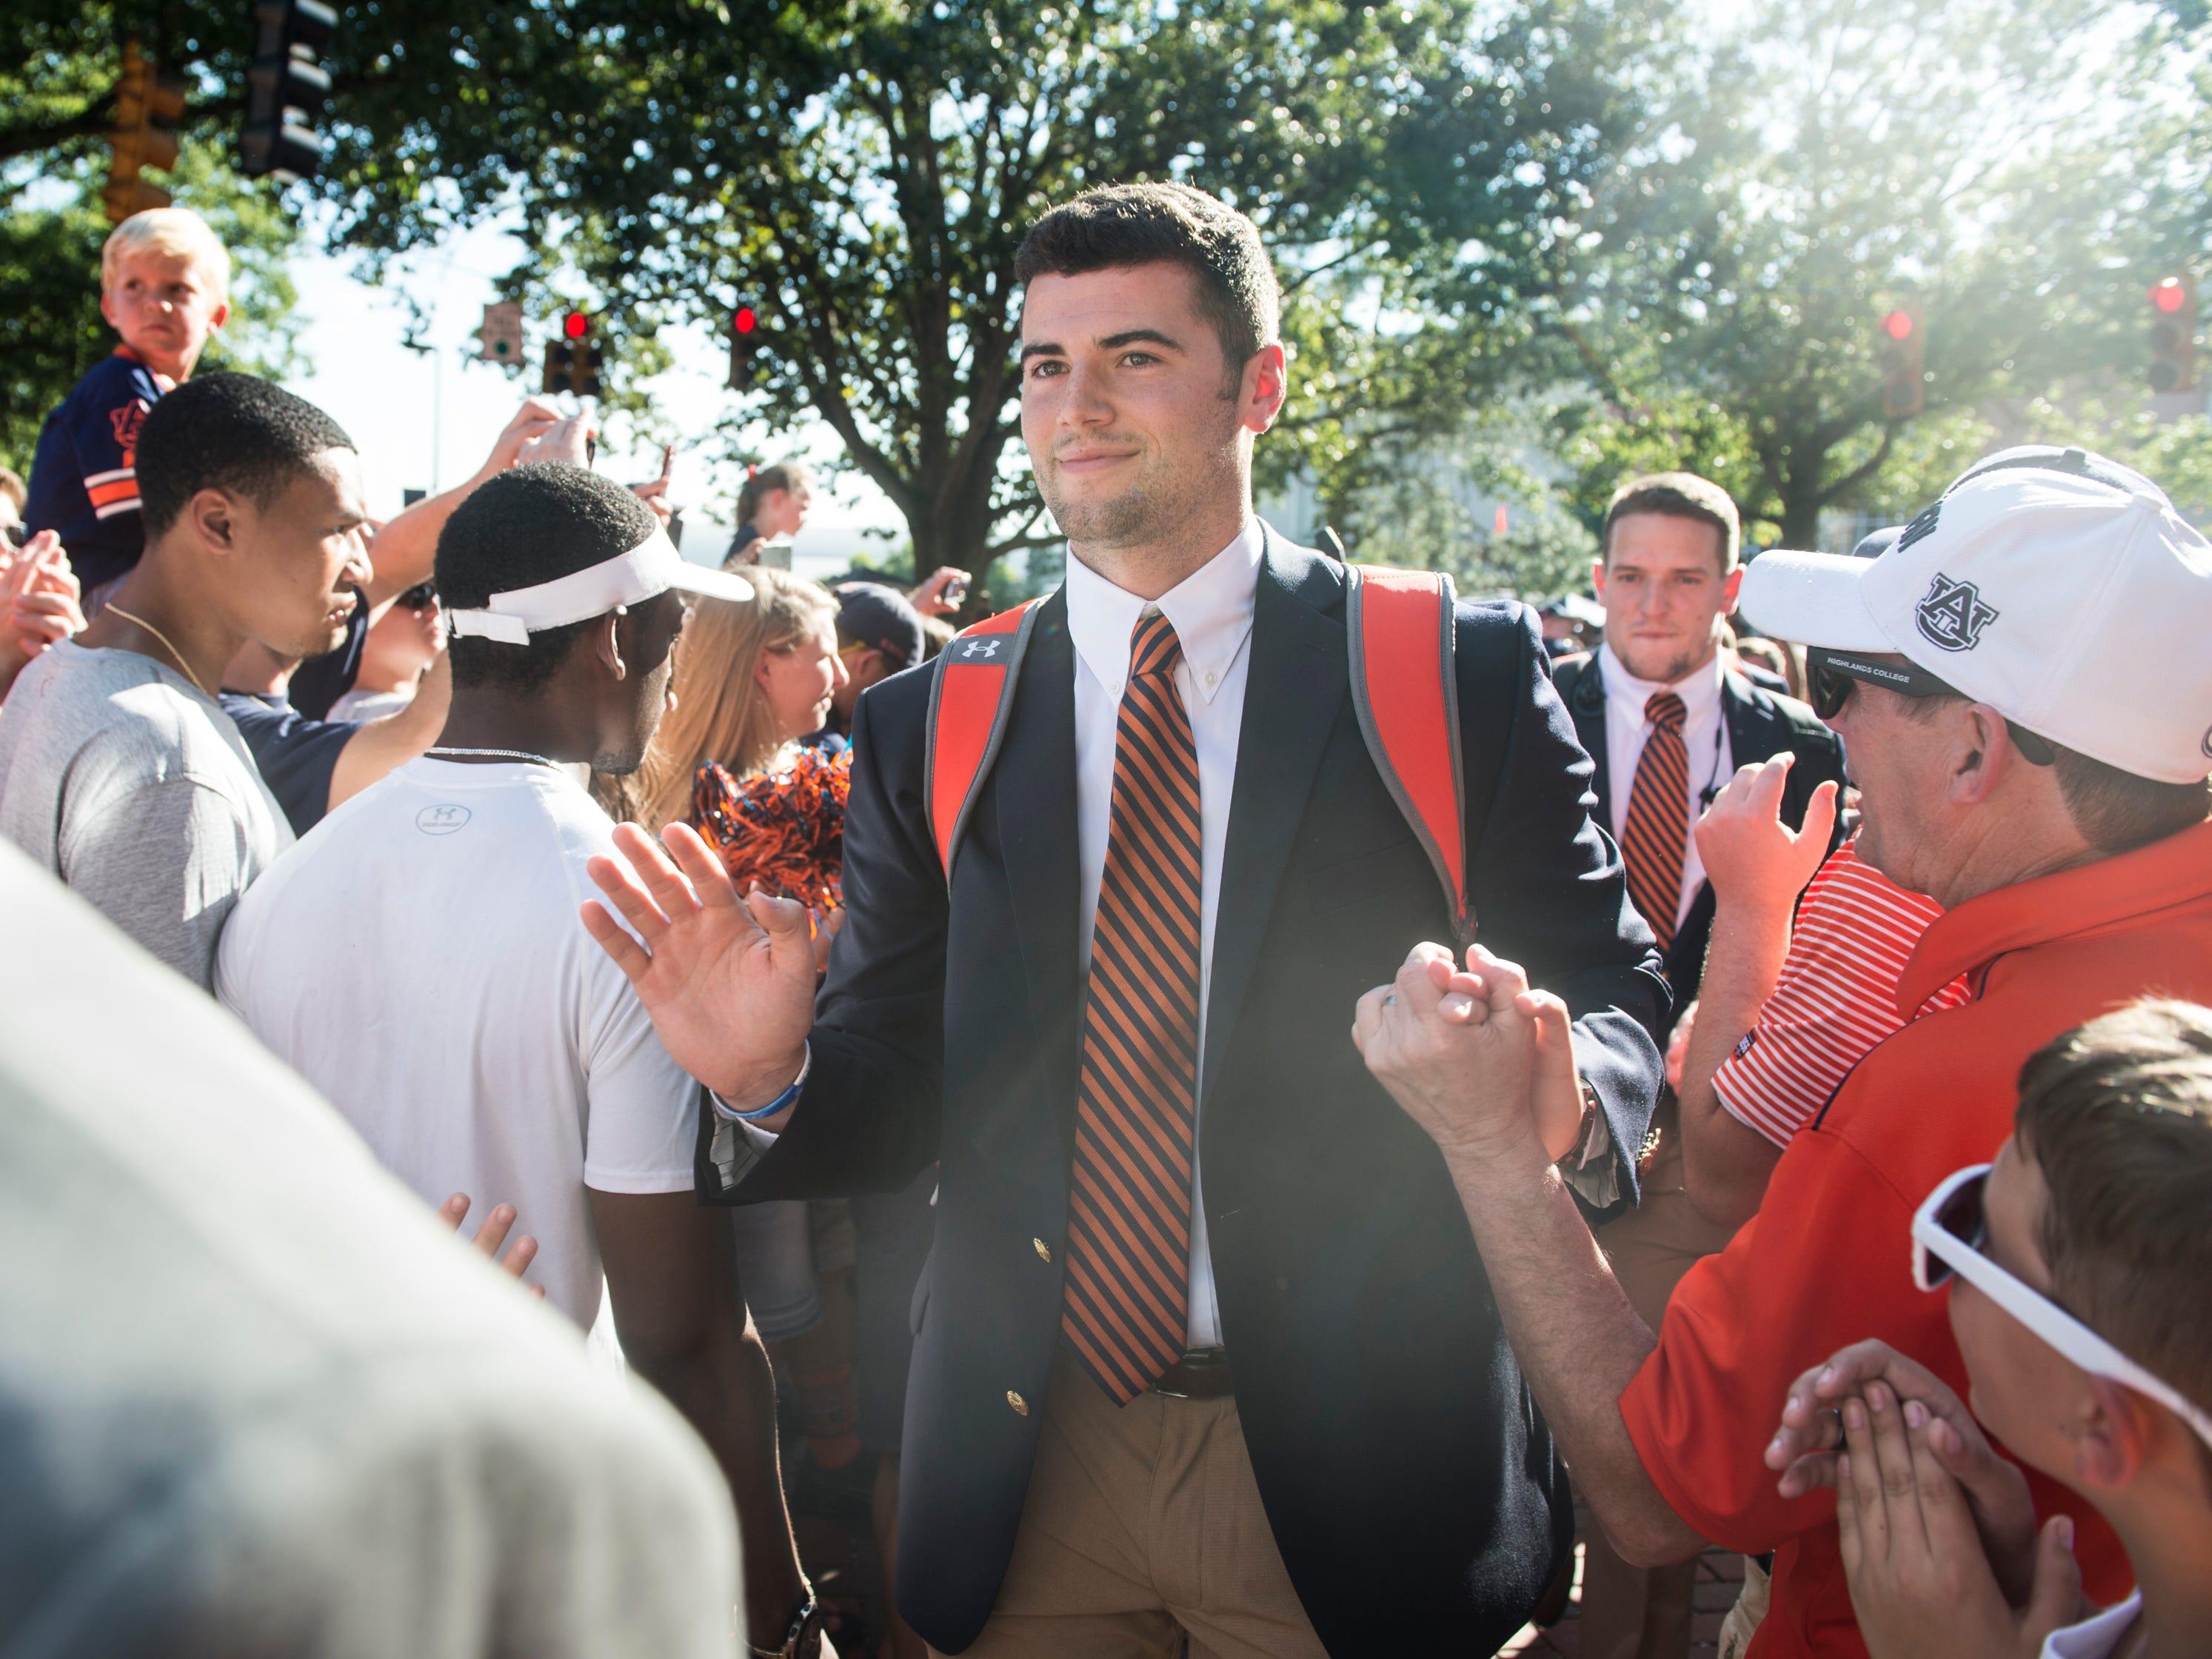 Auburn's Jarrett Stidham (8) makes his way through the Tiger Walk outside Jordan-Hare Stadium in Auburn, Ala., on Saturday, Sept. 8, 2018.